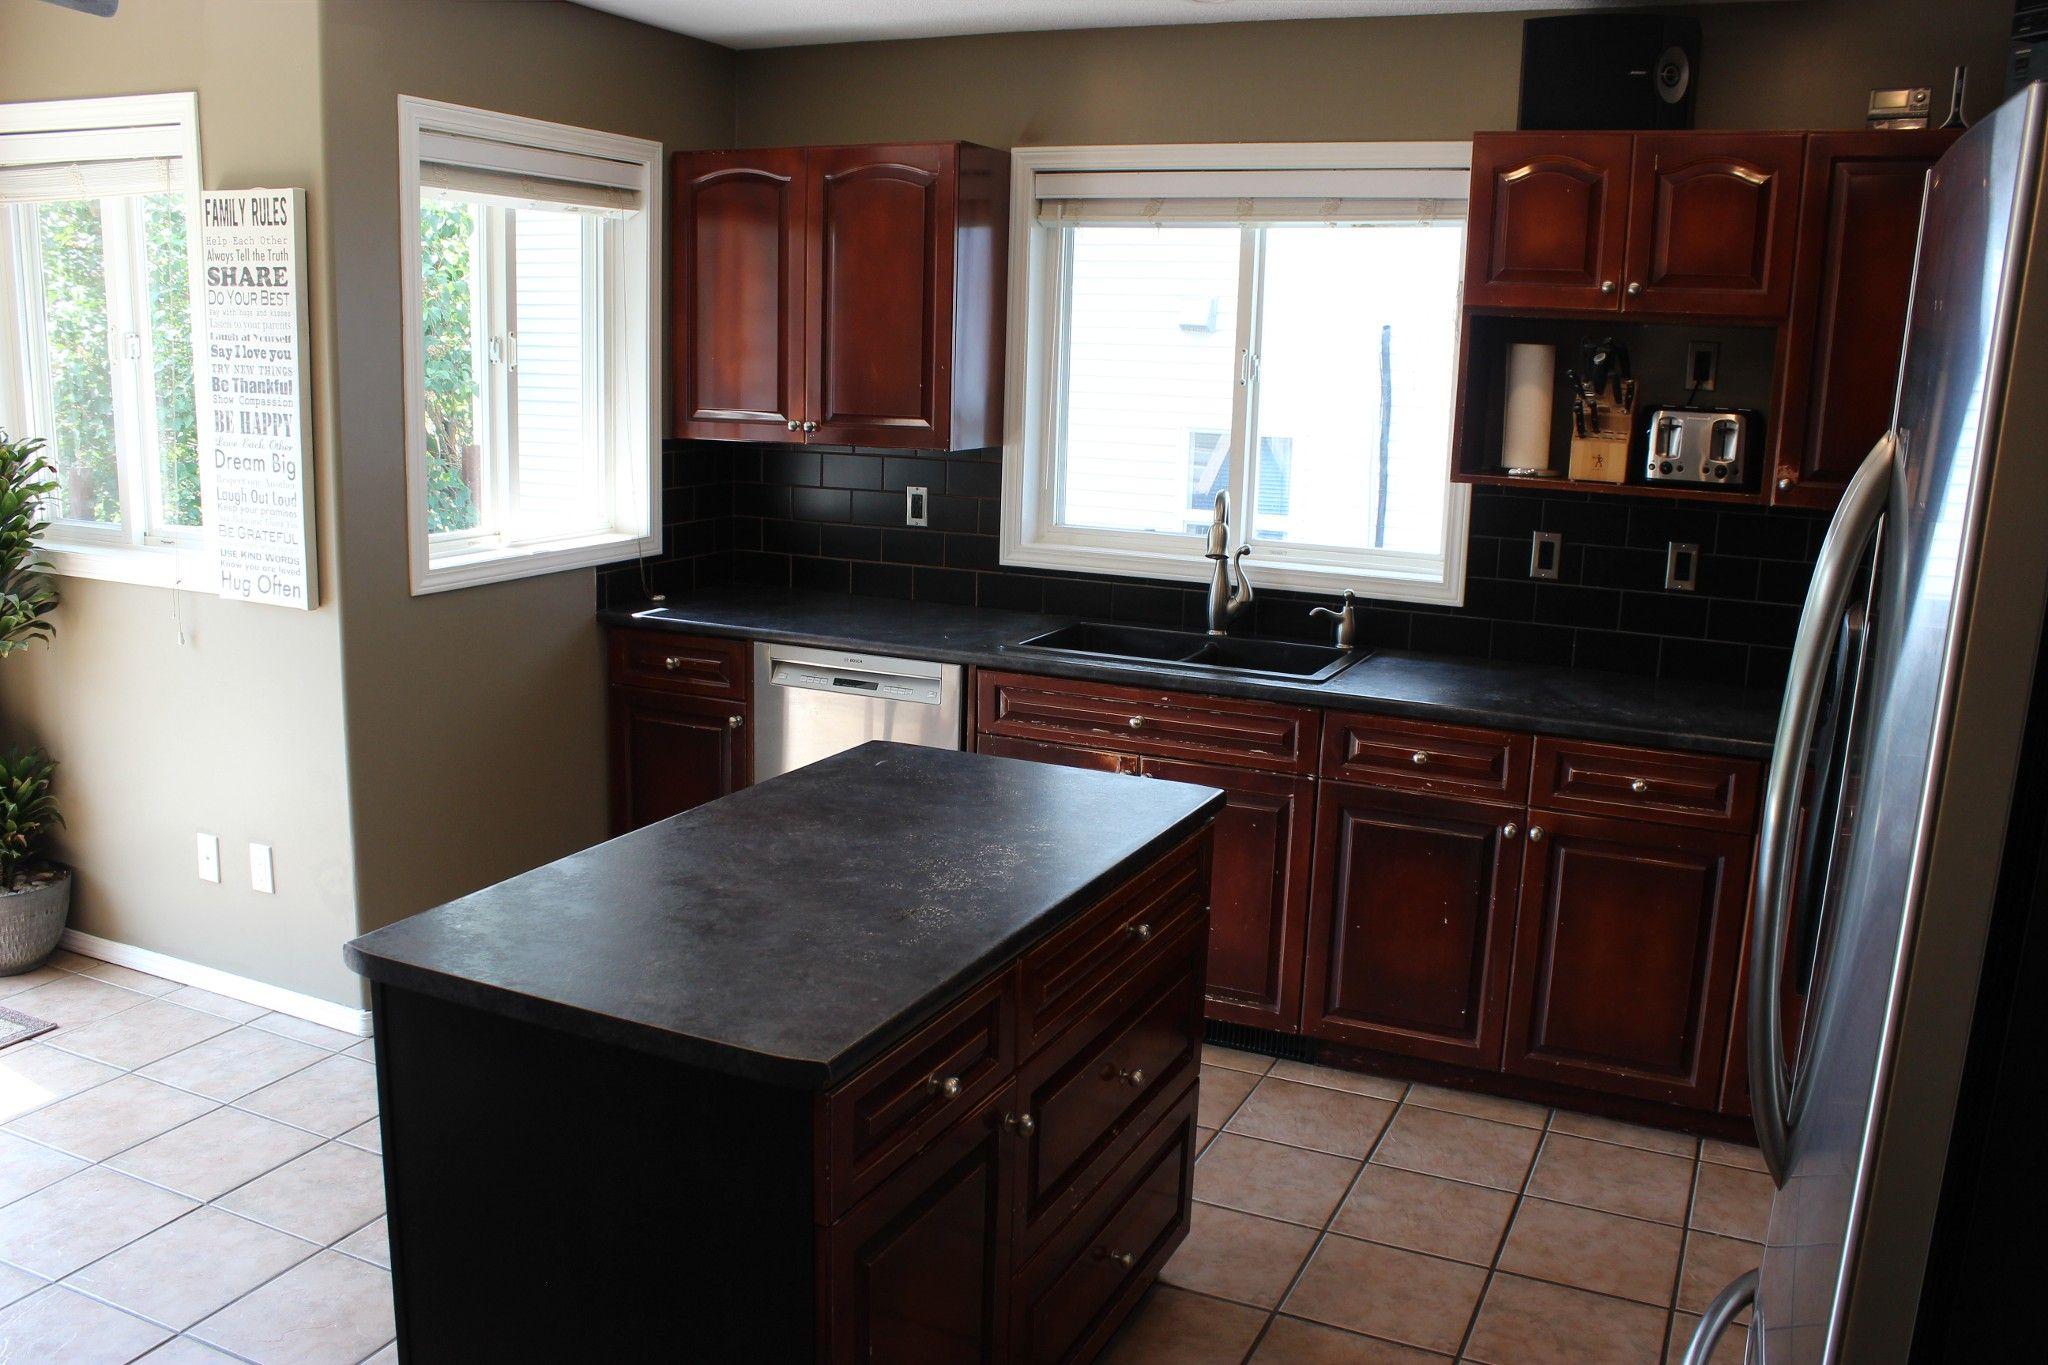 Photo 5: Photos: 729 McArthur Drive in Kamloops: Westsyde House for sale : MLS®# 151627